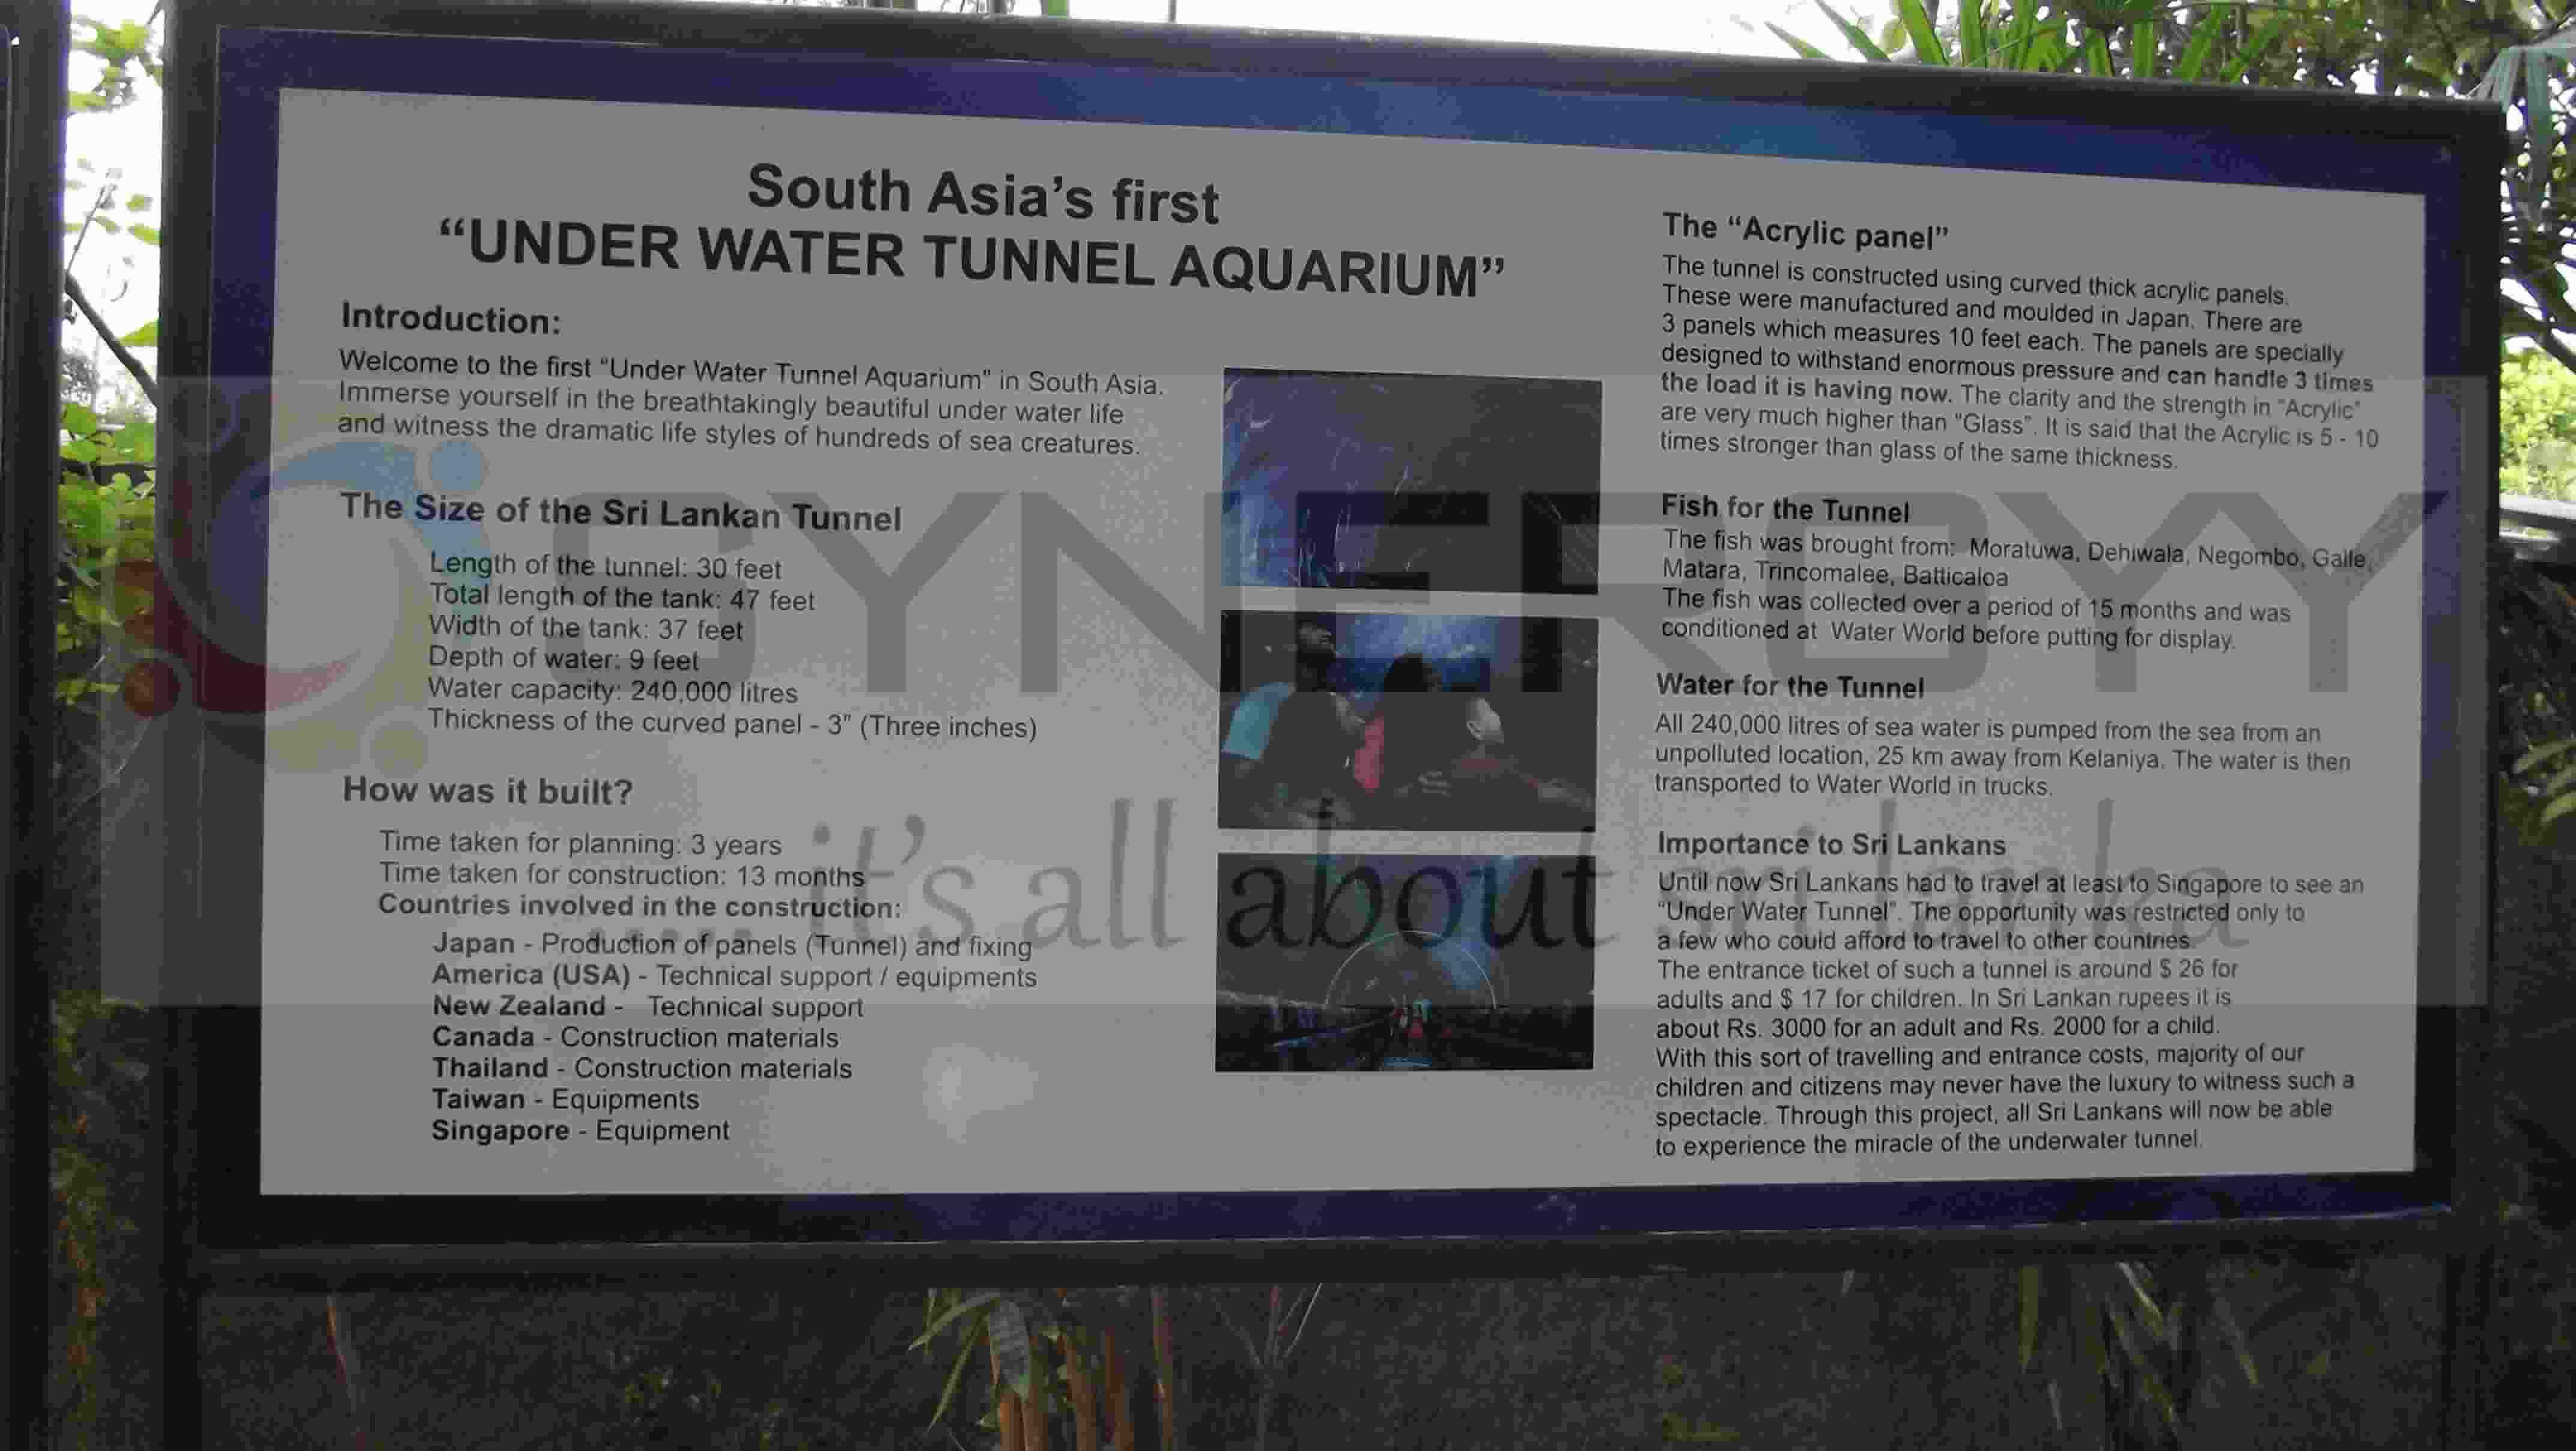 Aquarium fish tank sri lanka - Water World Under Water Tunnel Aquarium In Srilanka 1